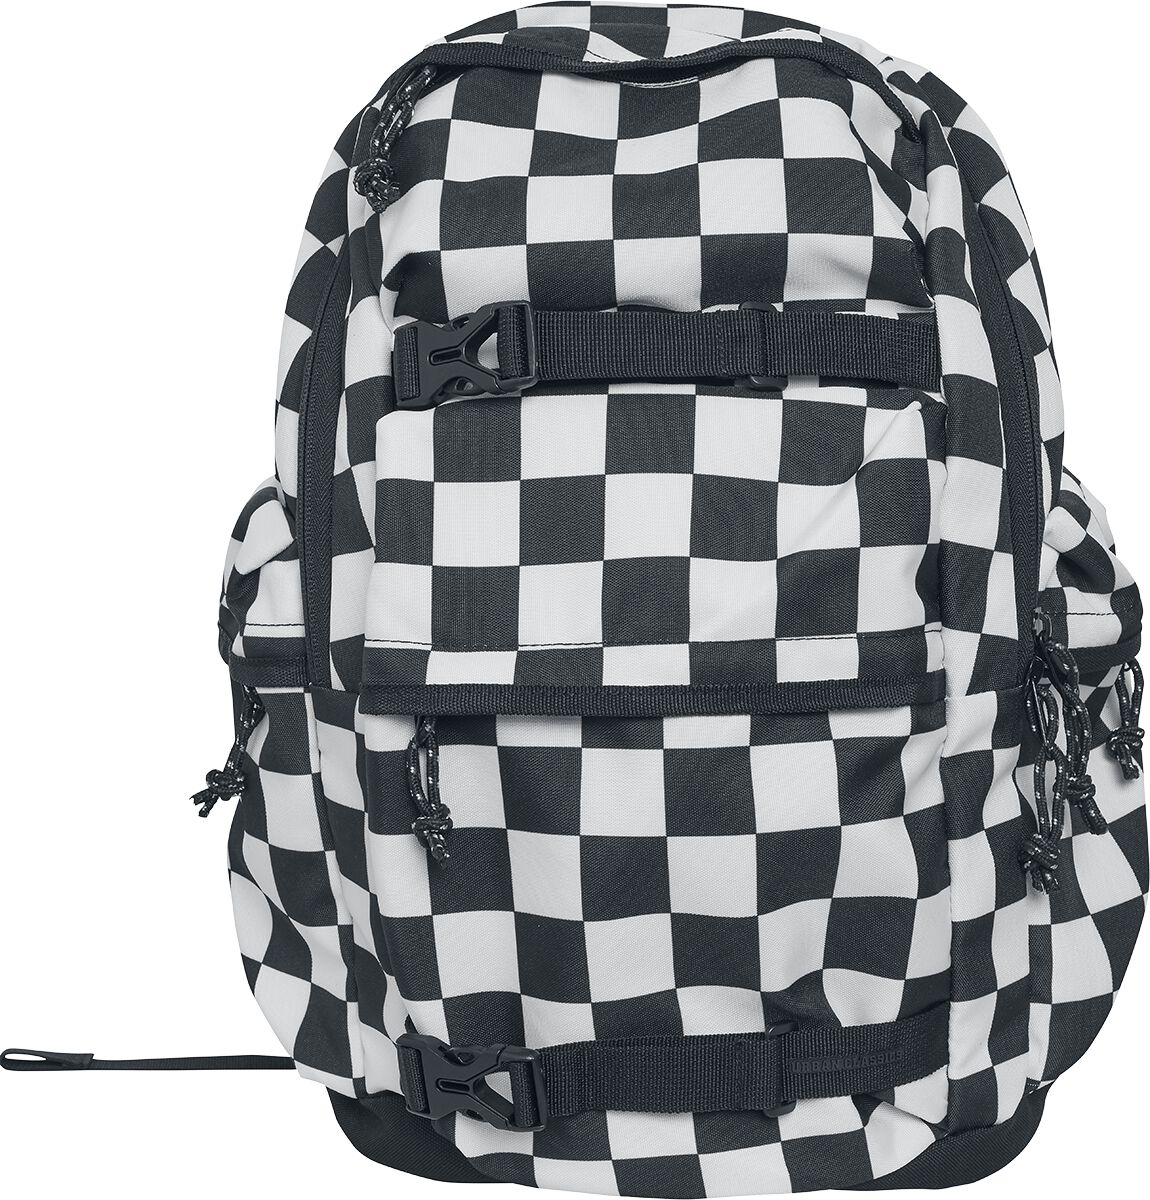 Image of   Urban Classics Backpack Checker Rygsæk sort-hvid